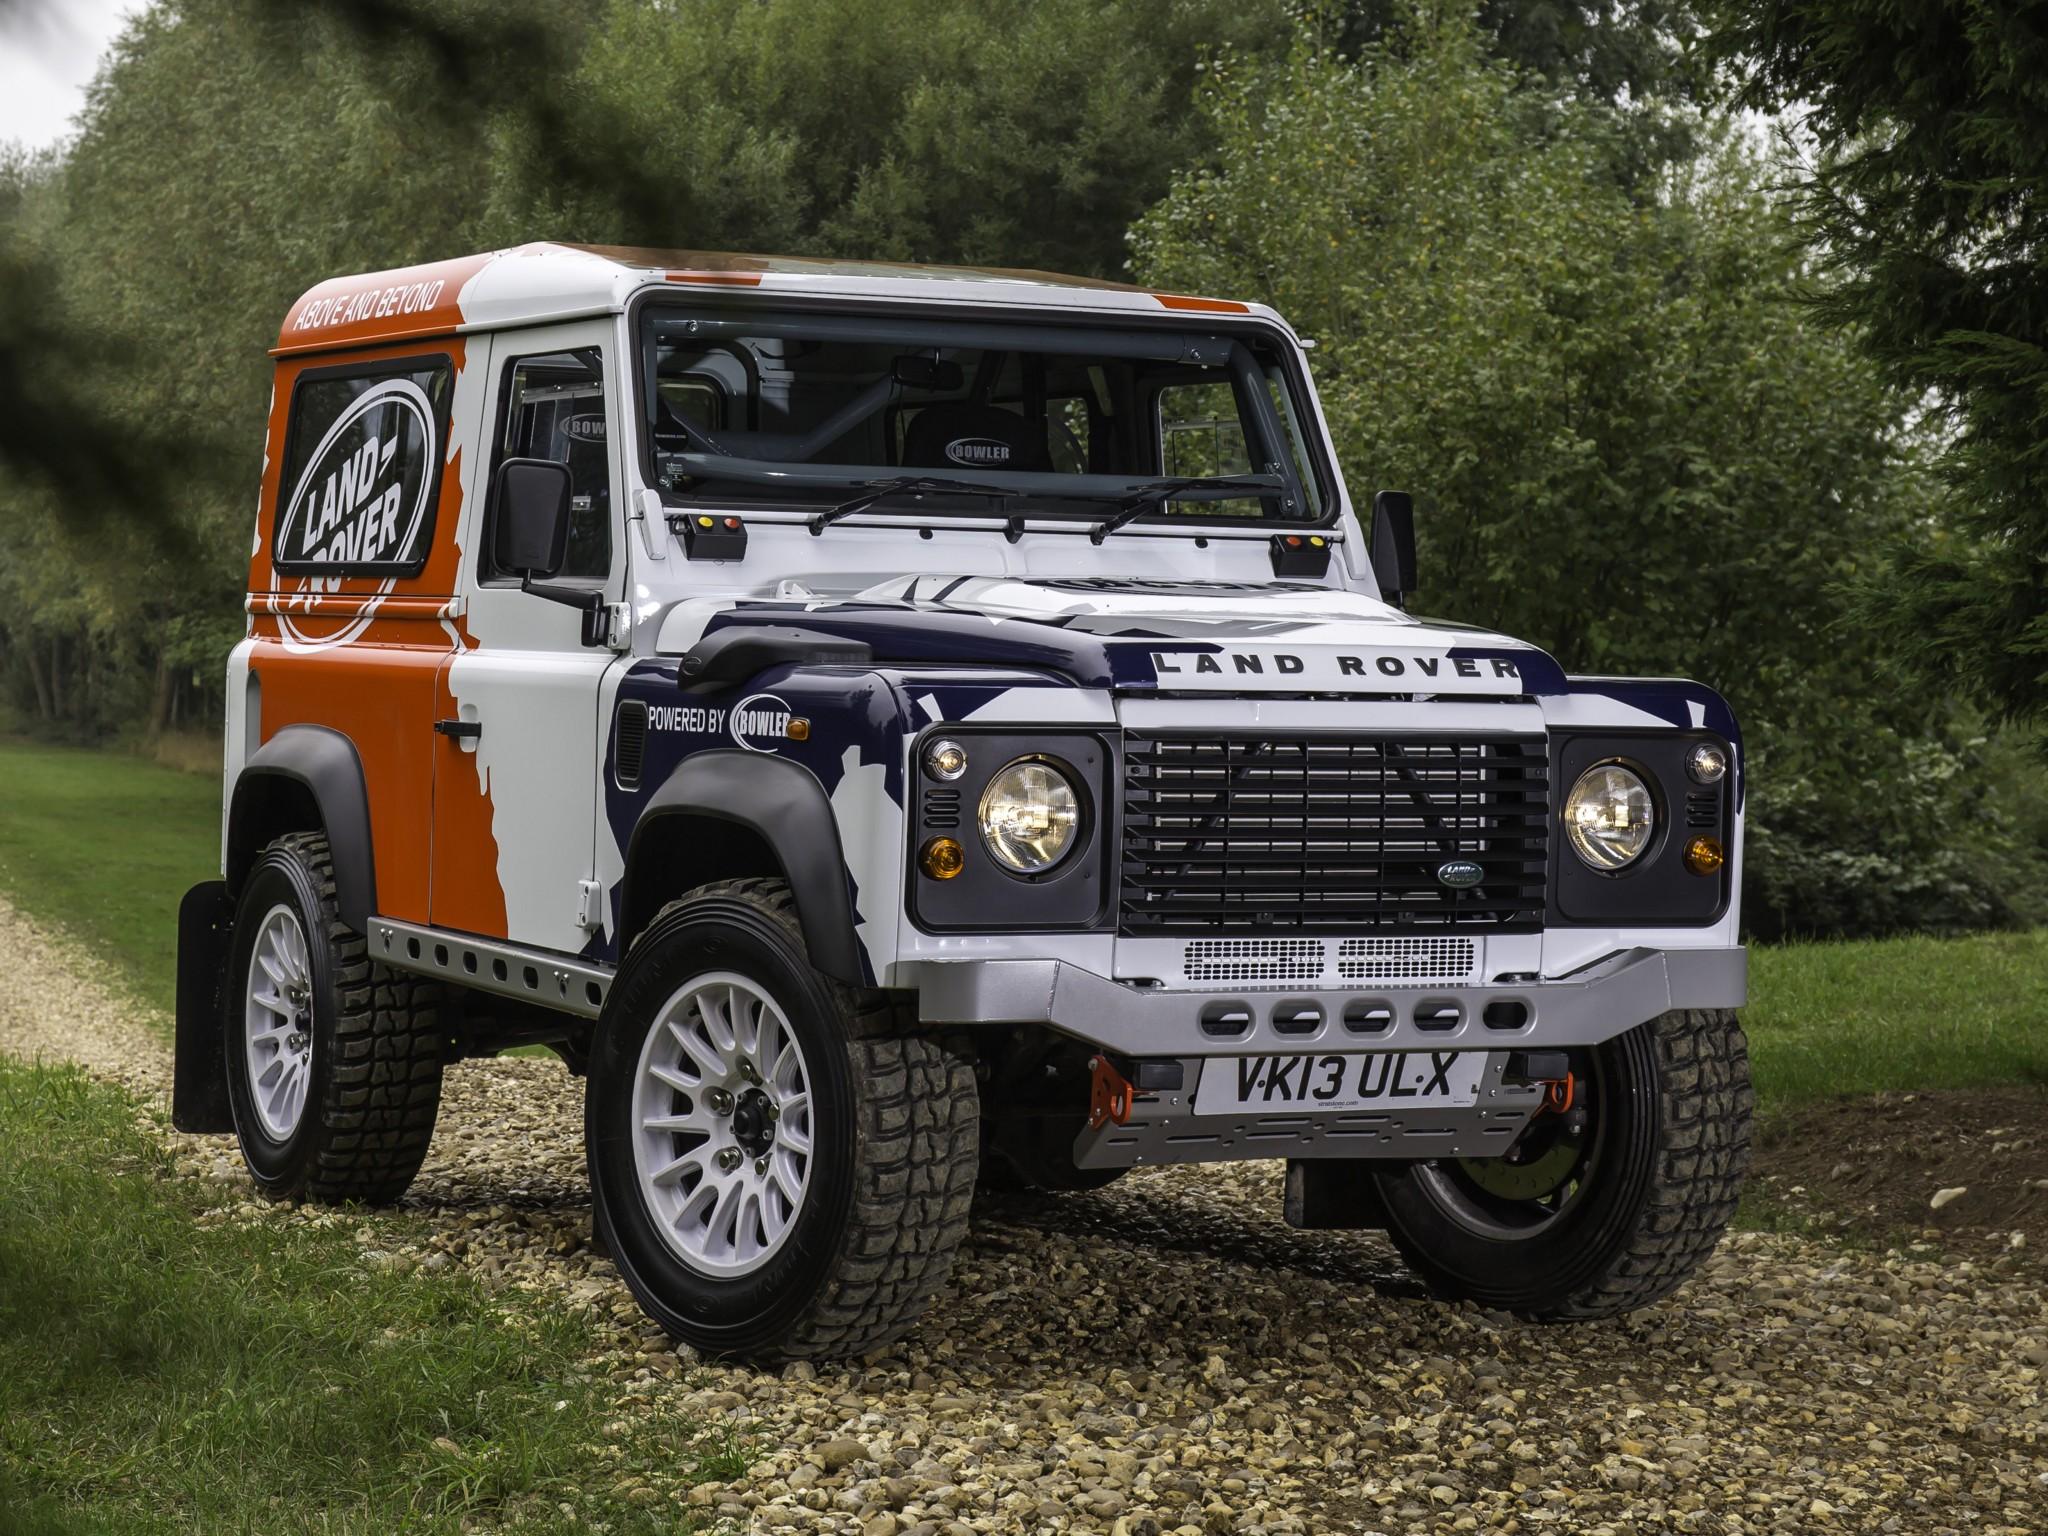 Land Rover Defender Challenge Truck suv 4x4 f wallpaper background 2048x1536